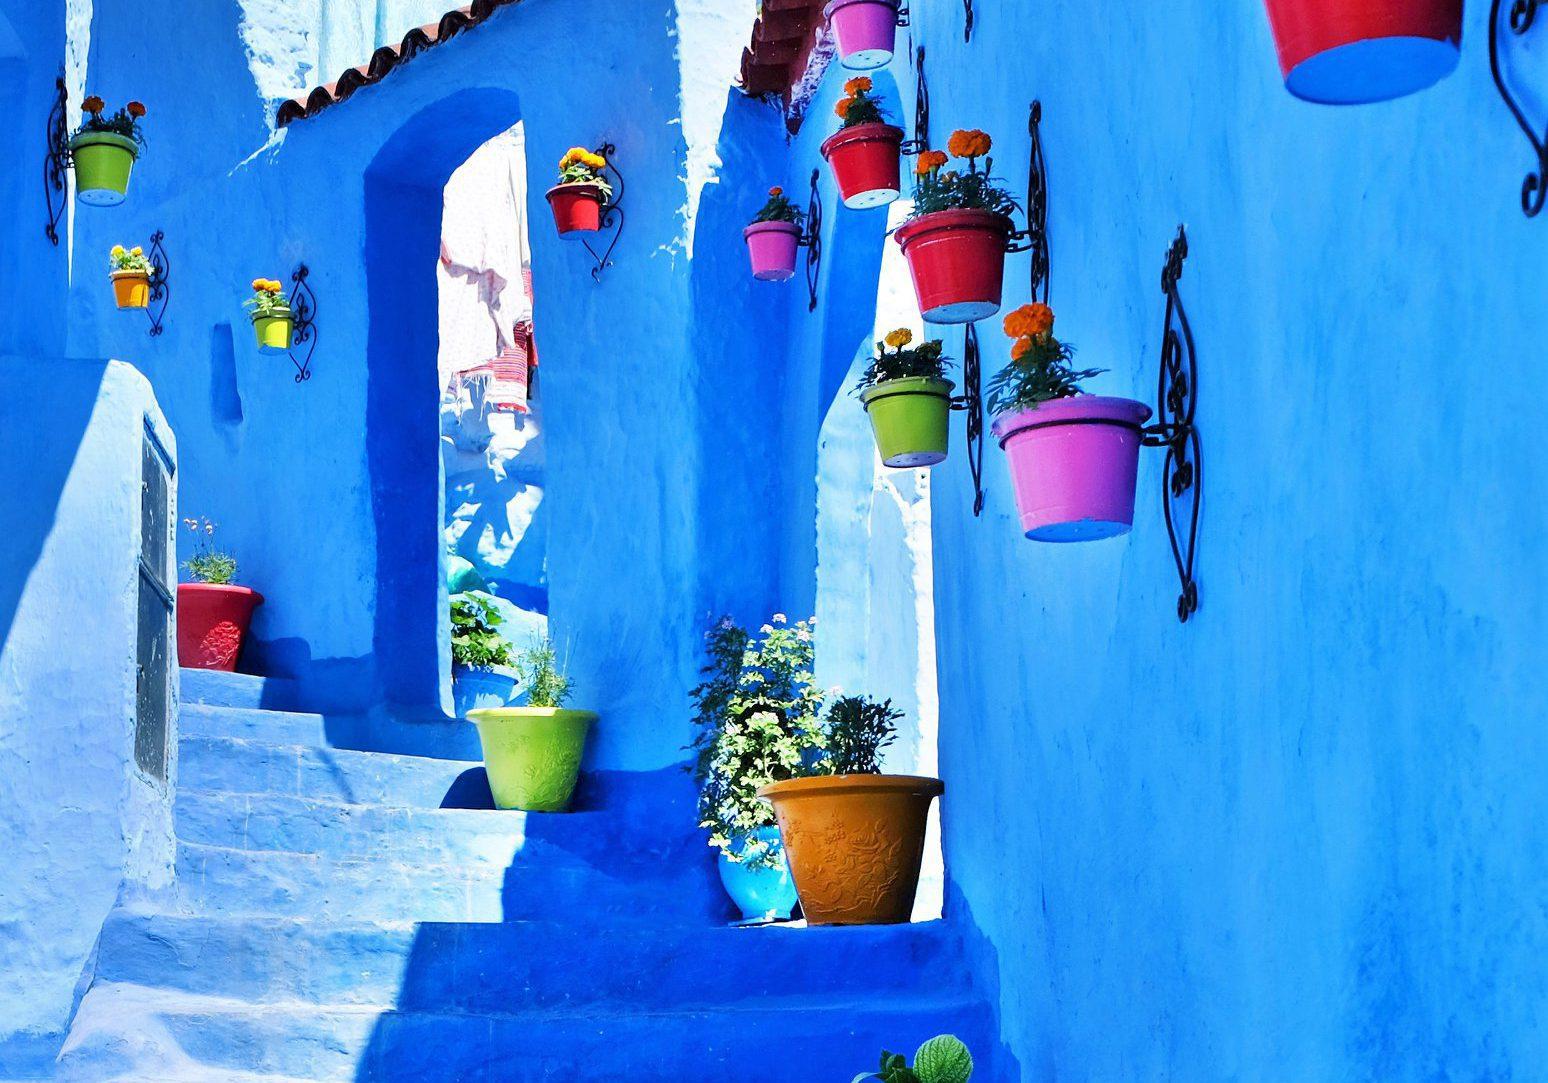 Marrakech - Merzouga - Fes - Chefchaouen 7